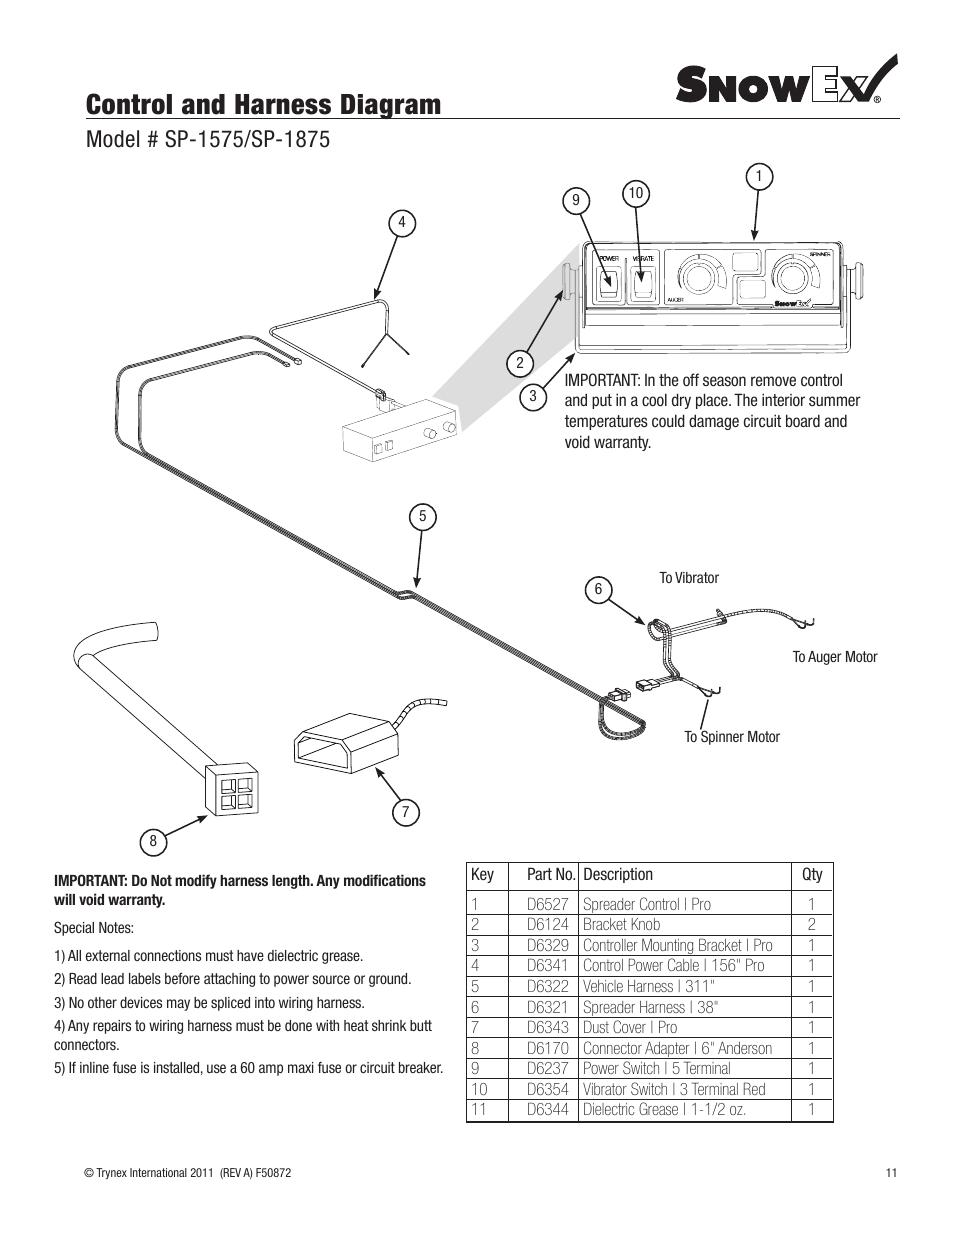 medium resolution of snowex wiring diagram wiring diagram centre snowex wiring diagram control and harness diagram snowex sp 1875